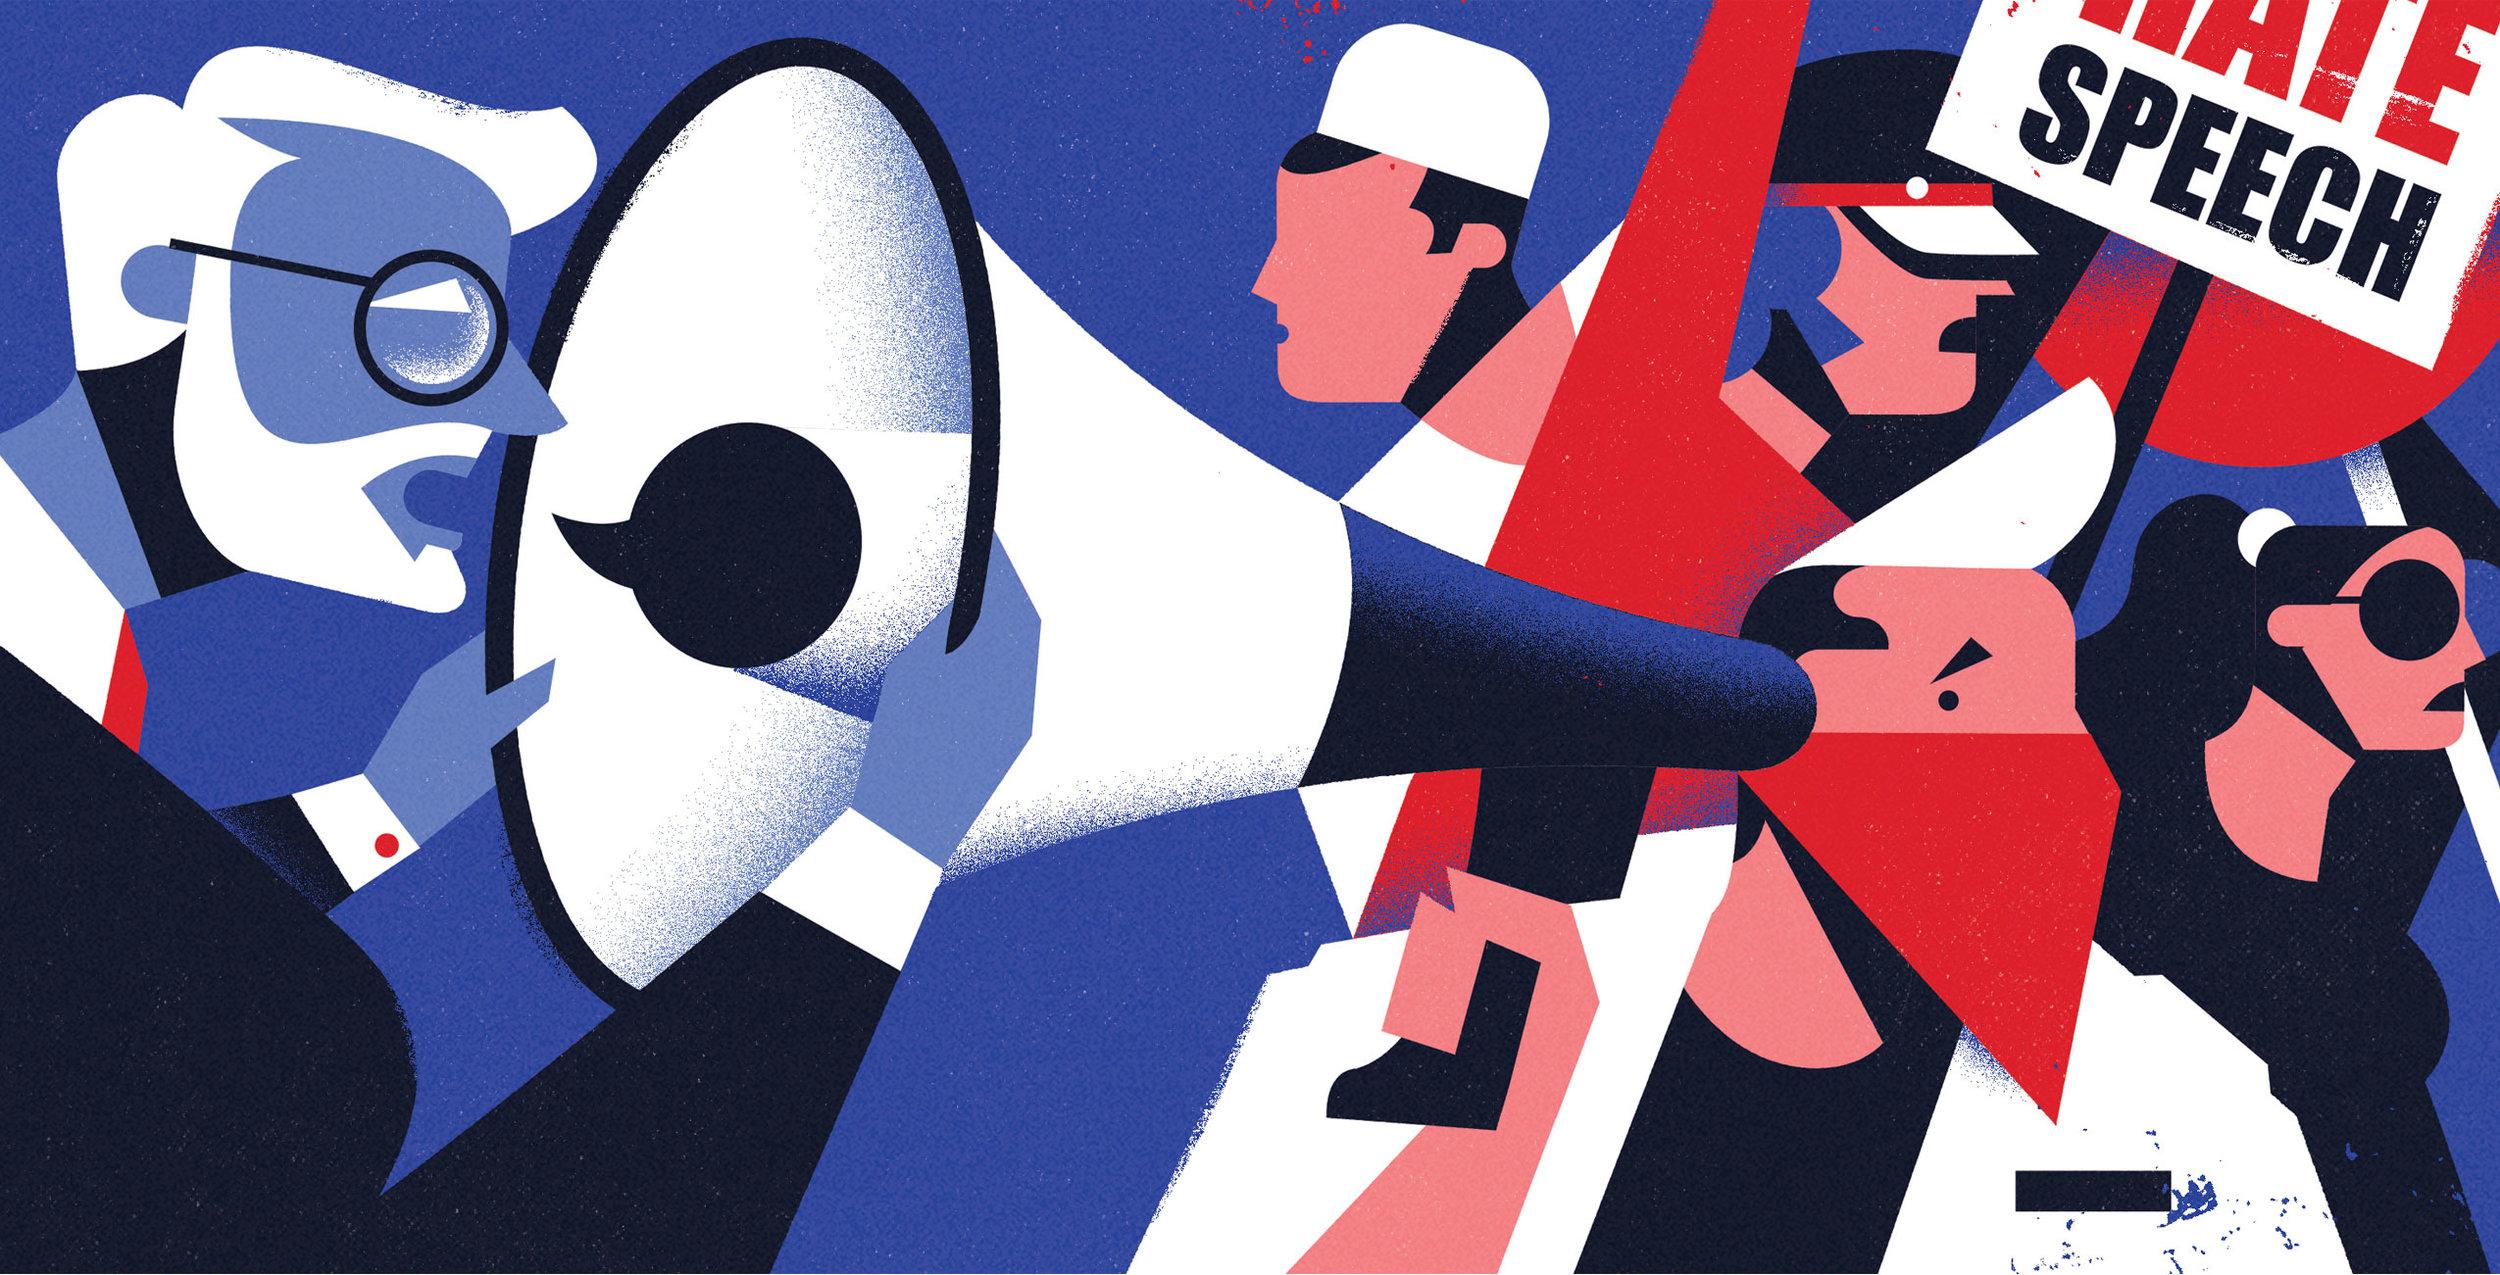 dale edwin murray freelance illustrator times higher education editorial illustration